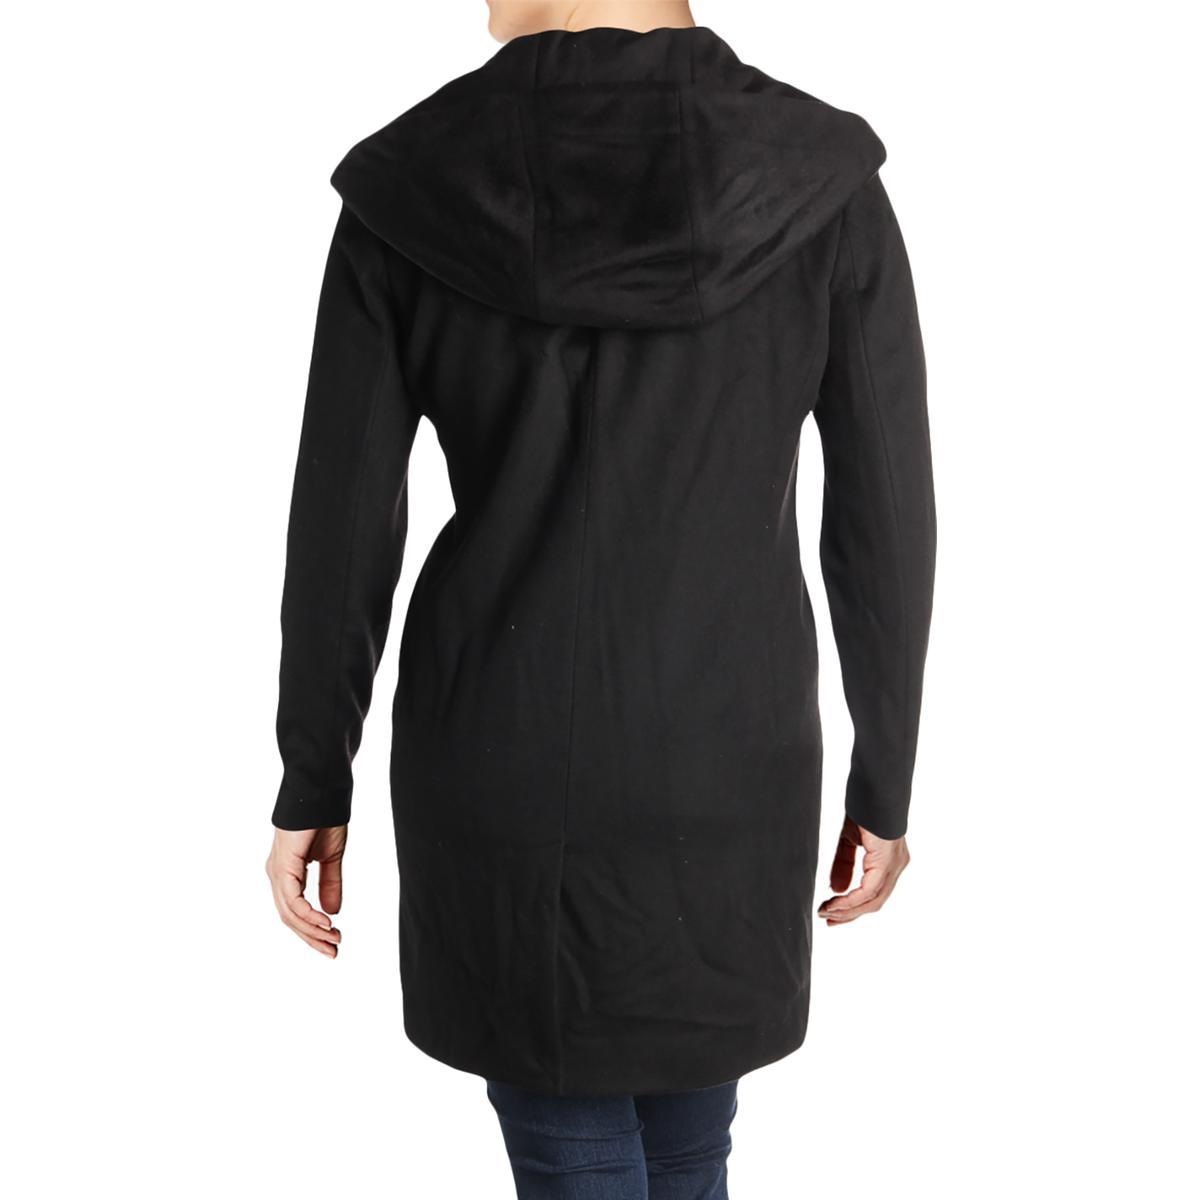 Karl-Lagerfeld-Paris-Womens-Winter-Wool-Blend-Midi-Coat-Outerwear-BHFO-6449 thumbnail 4